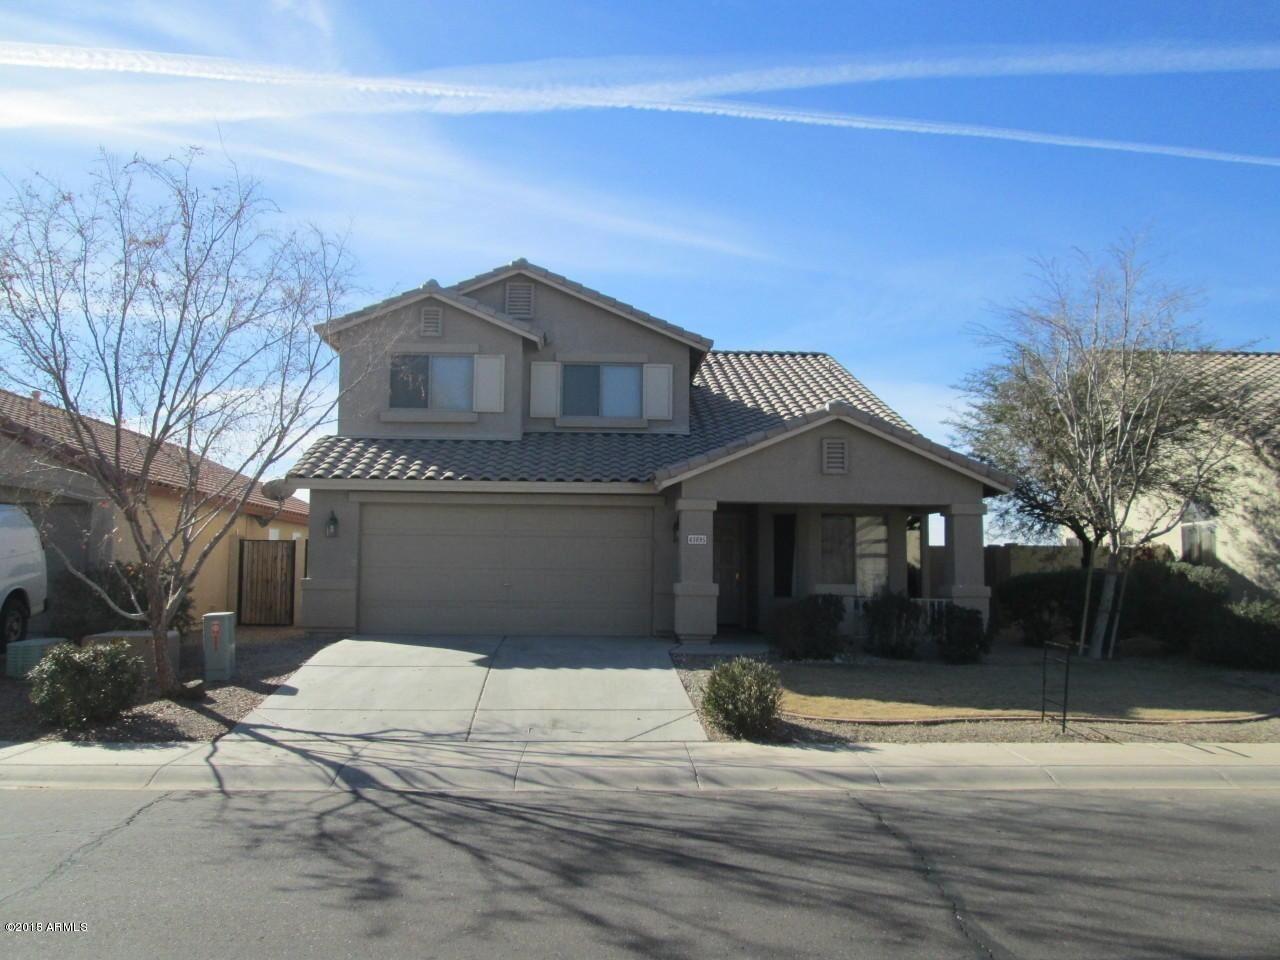 Photo of 43895 W WADE Drive, Maricopa, AZ 85138 (MLS # 6249240)